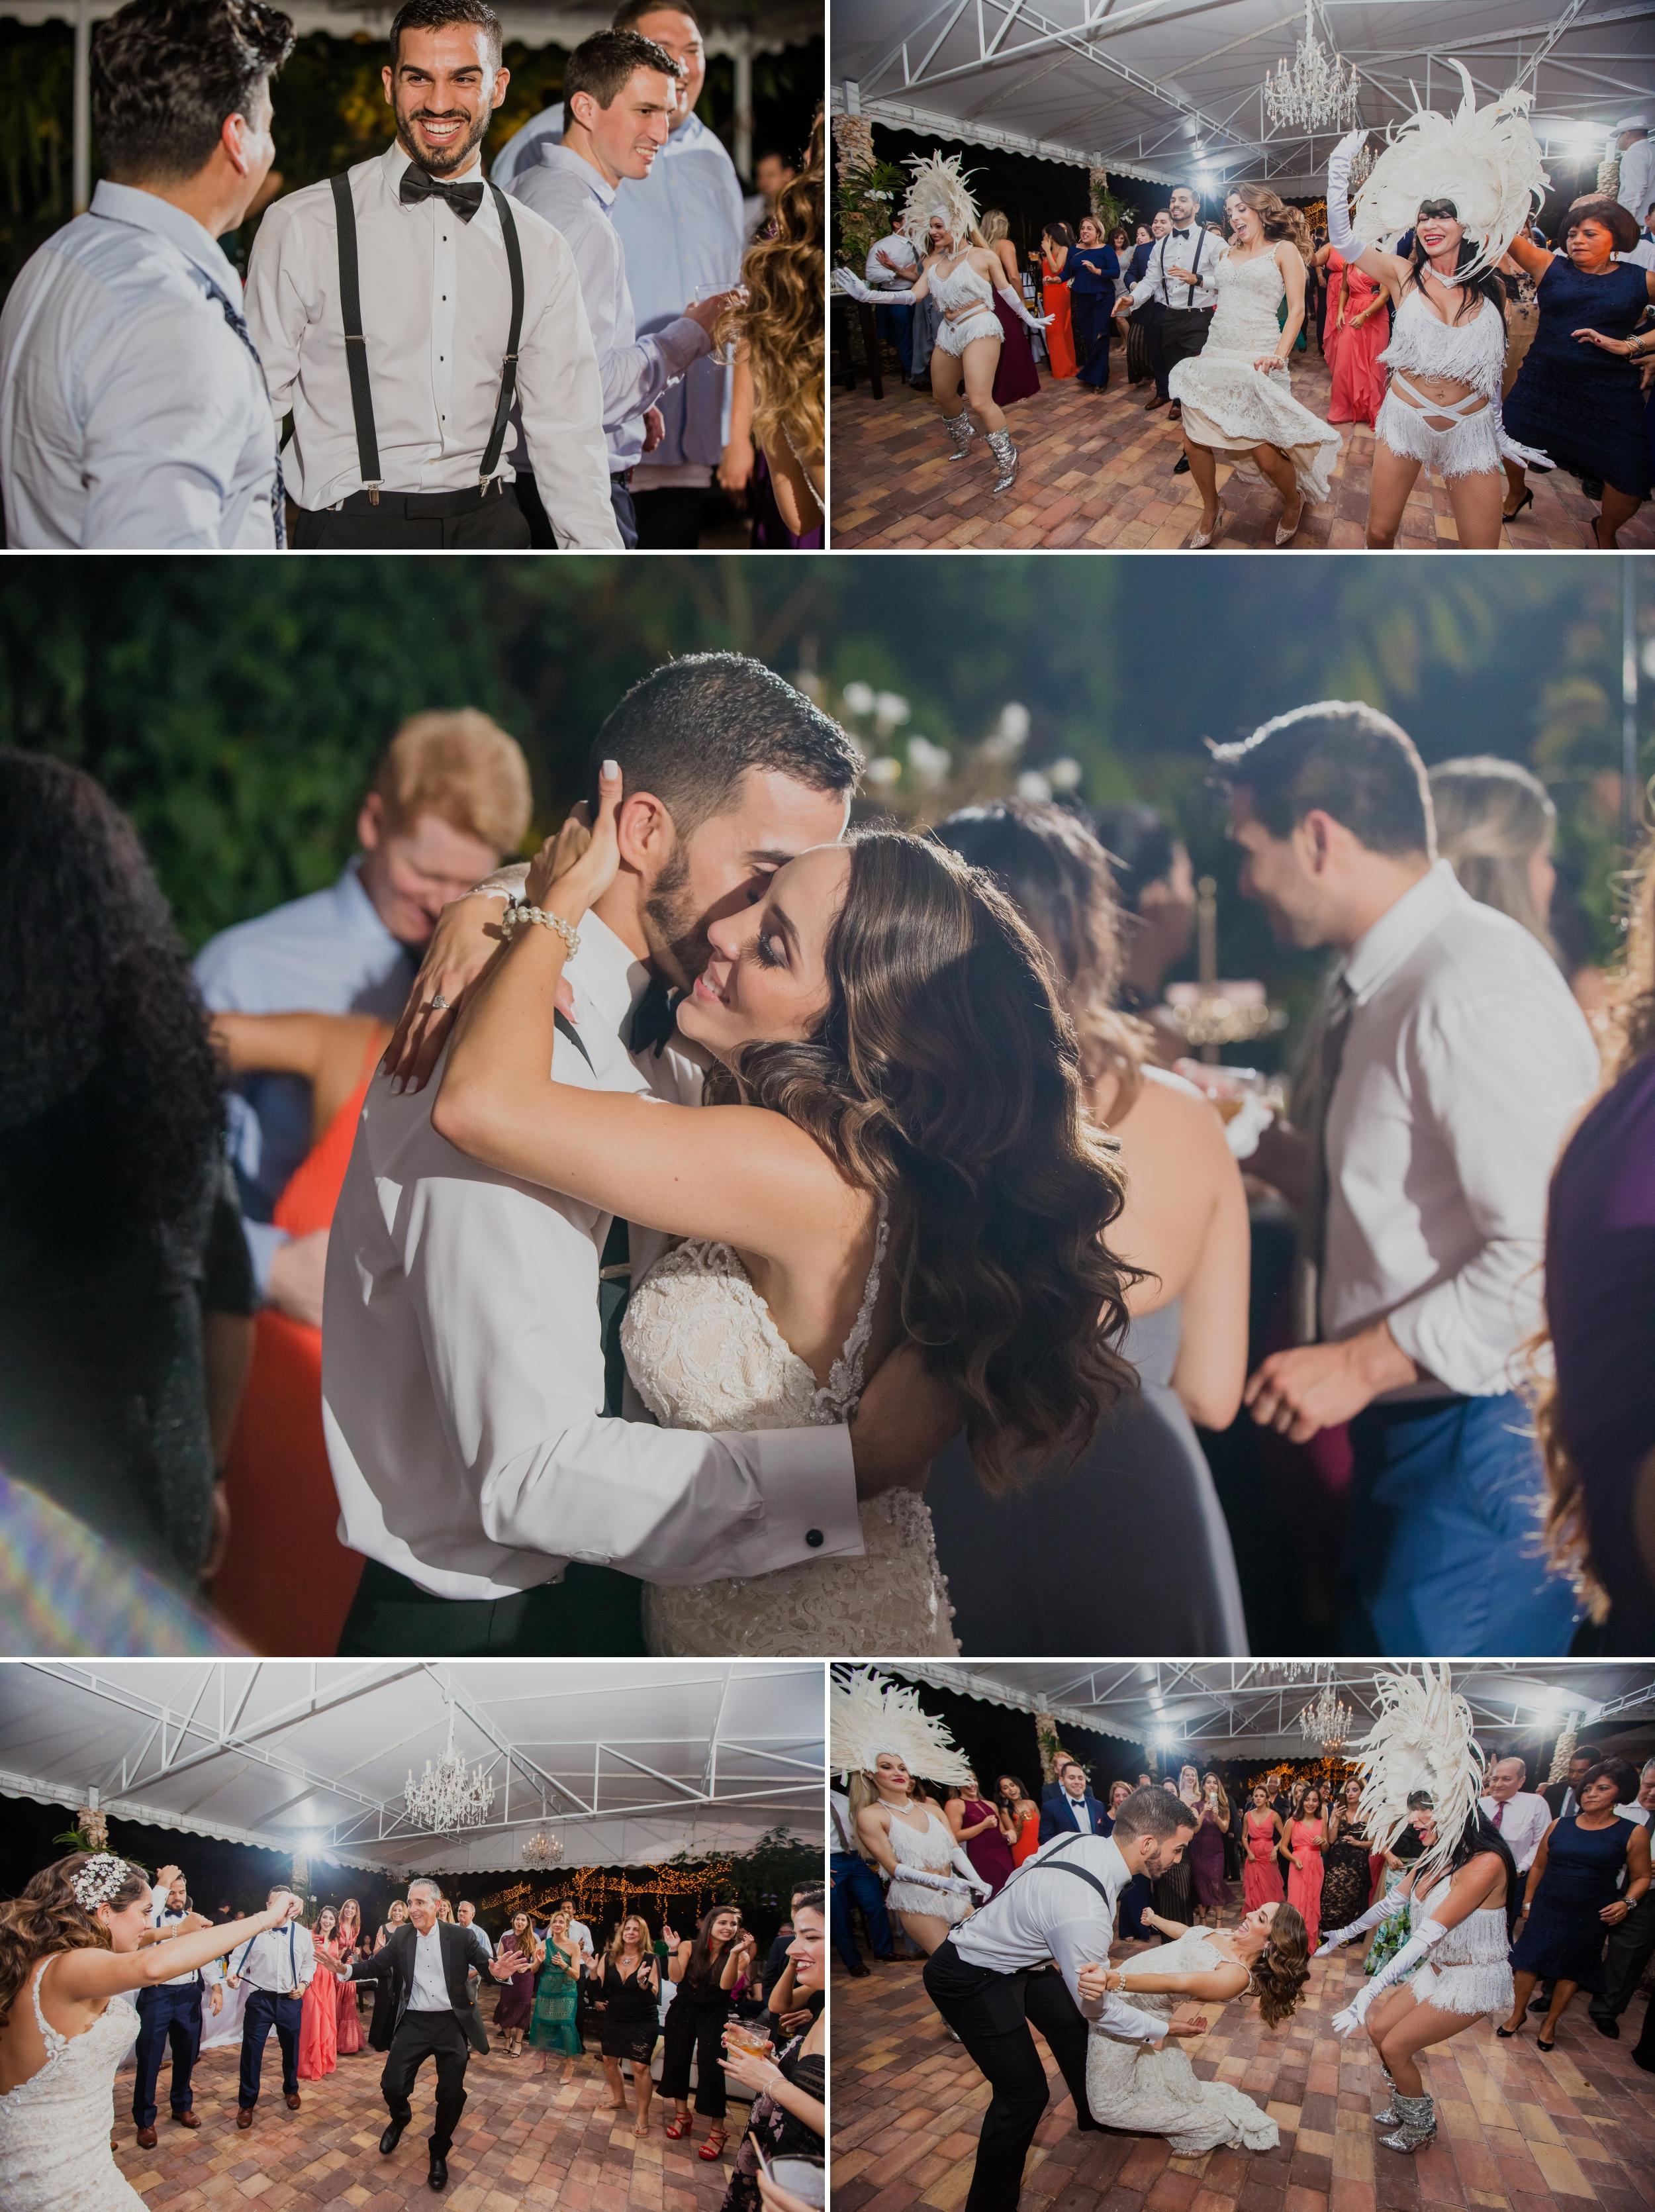 Wedding Miller Plantation Photography by Santy Martinez 18.jpg